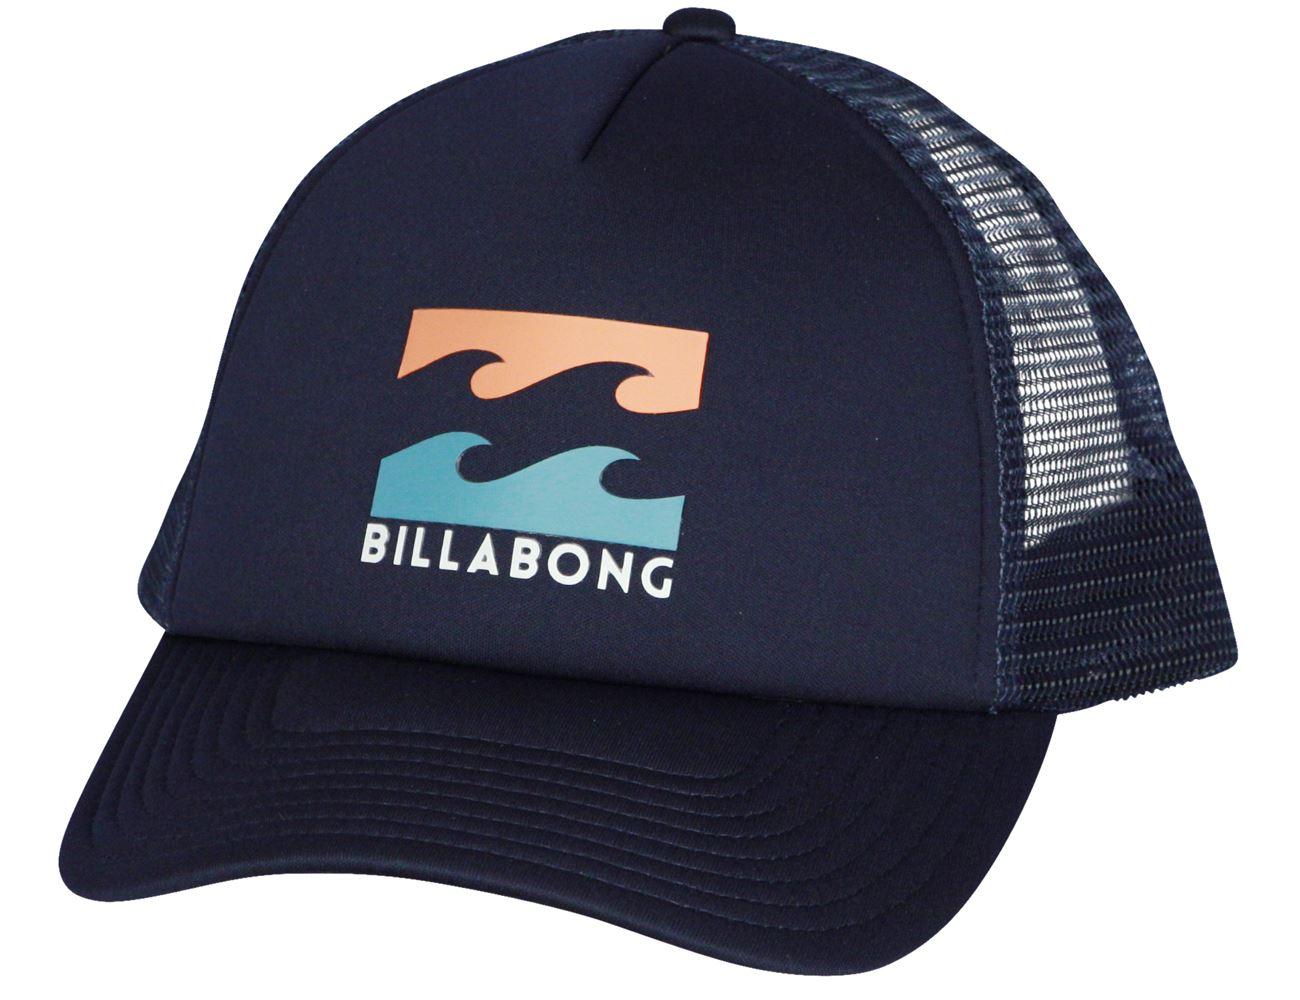 Billabong Trucker Snapback Cap ~ Podium indigo 3664564209438  44b13d54ecd4